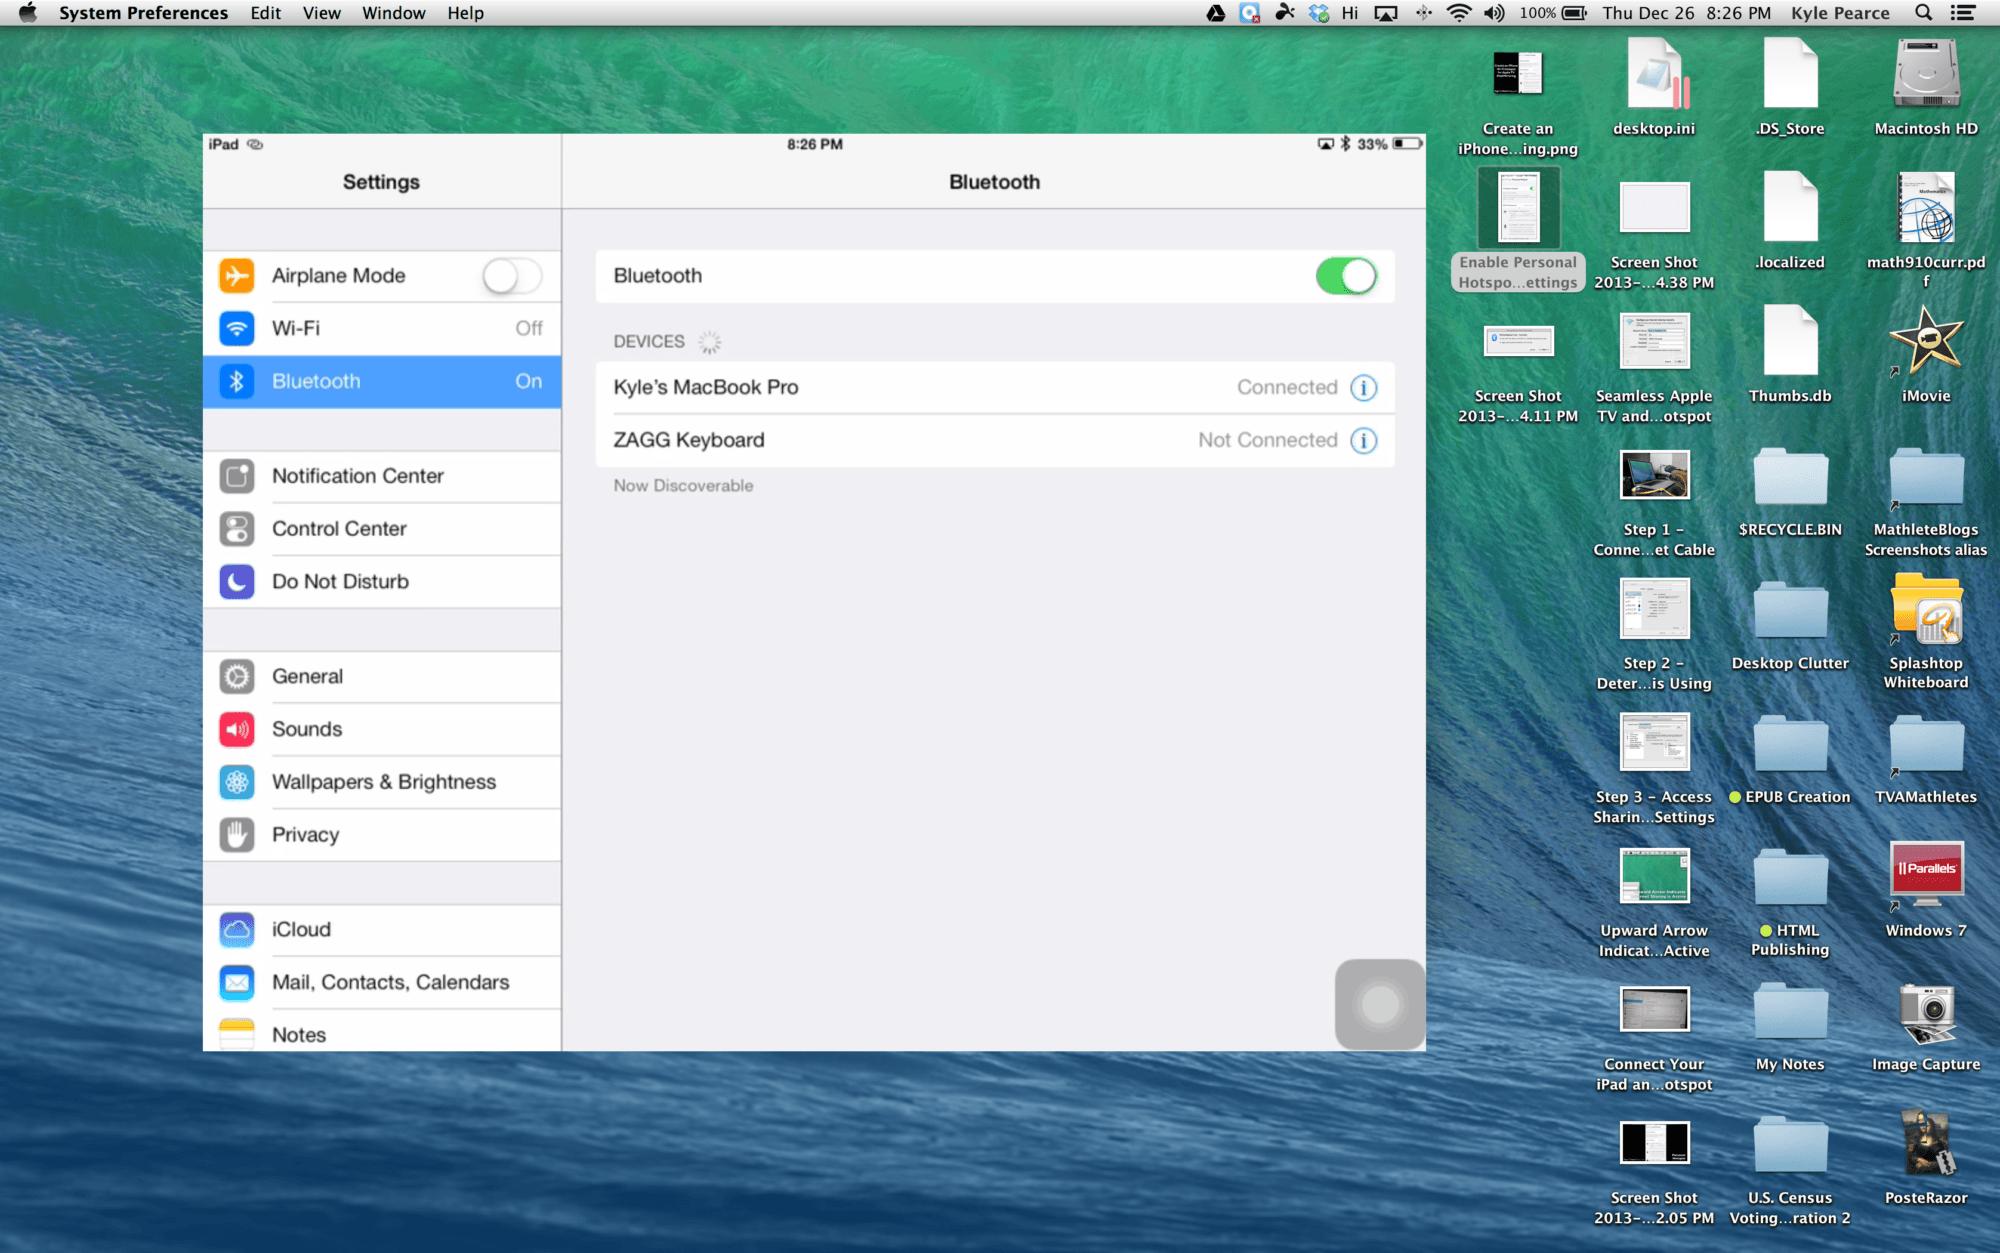 Seamless Apple TV iPad Mirroring 3 of 3: Bluetooth iPad